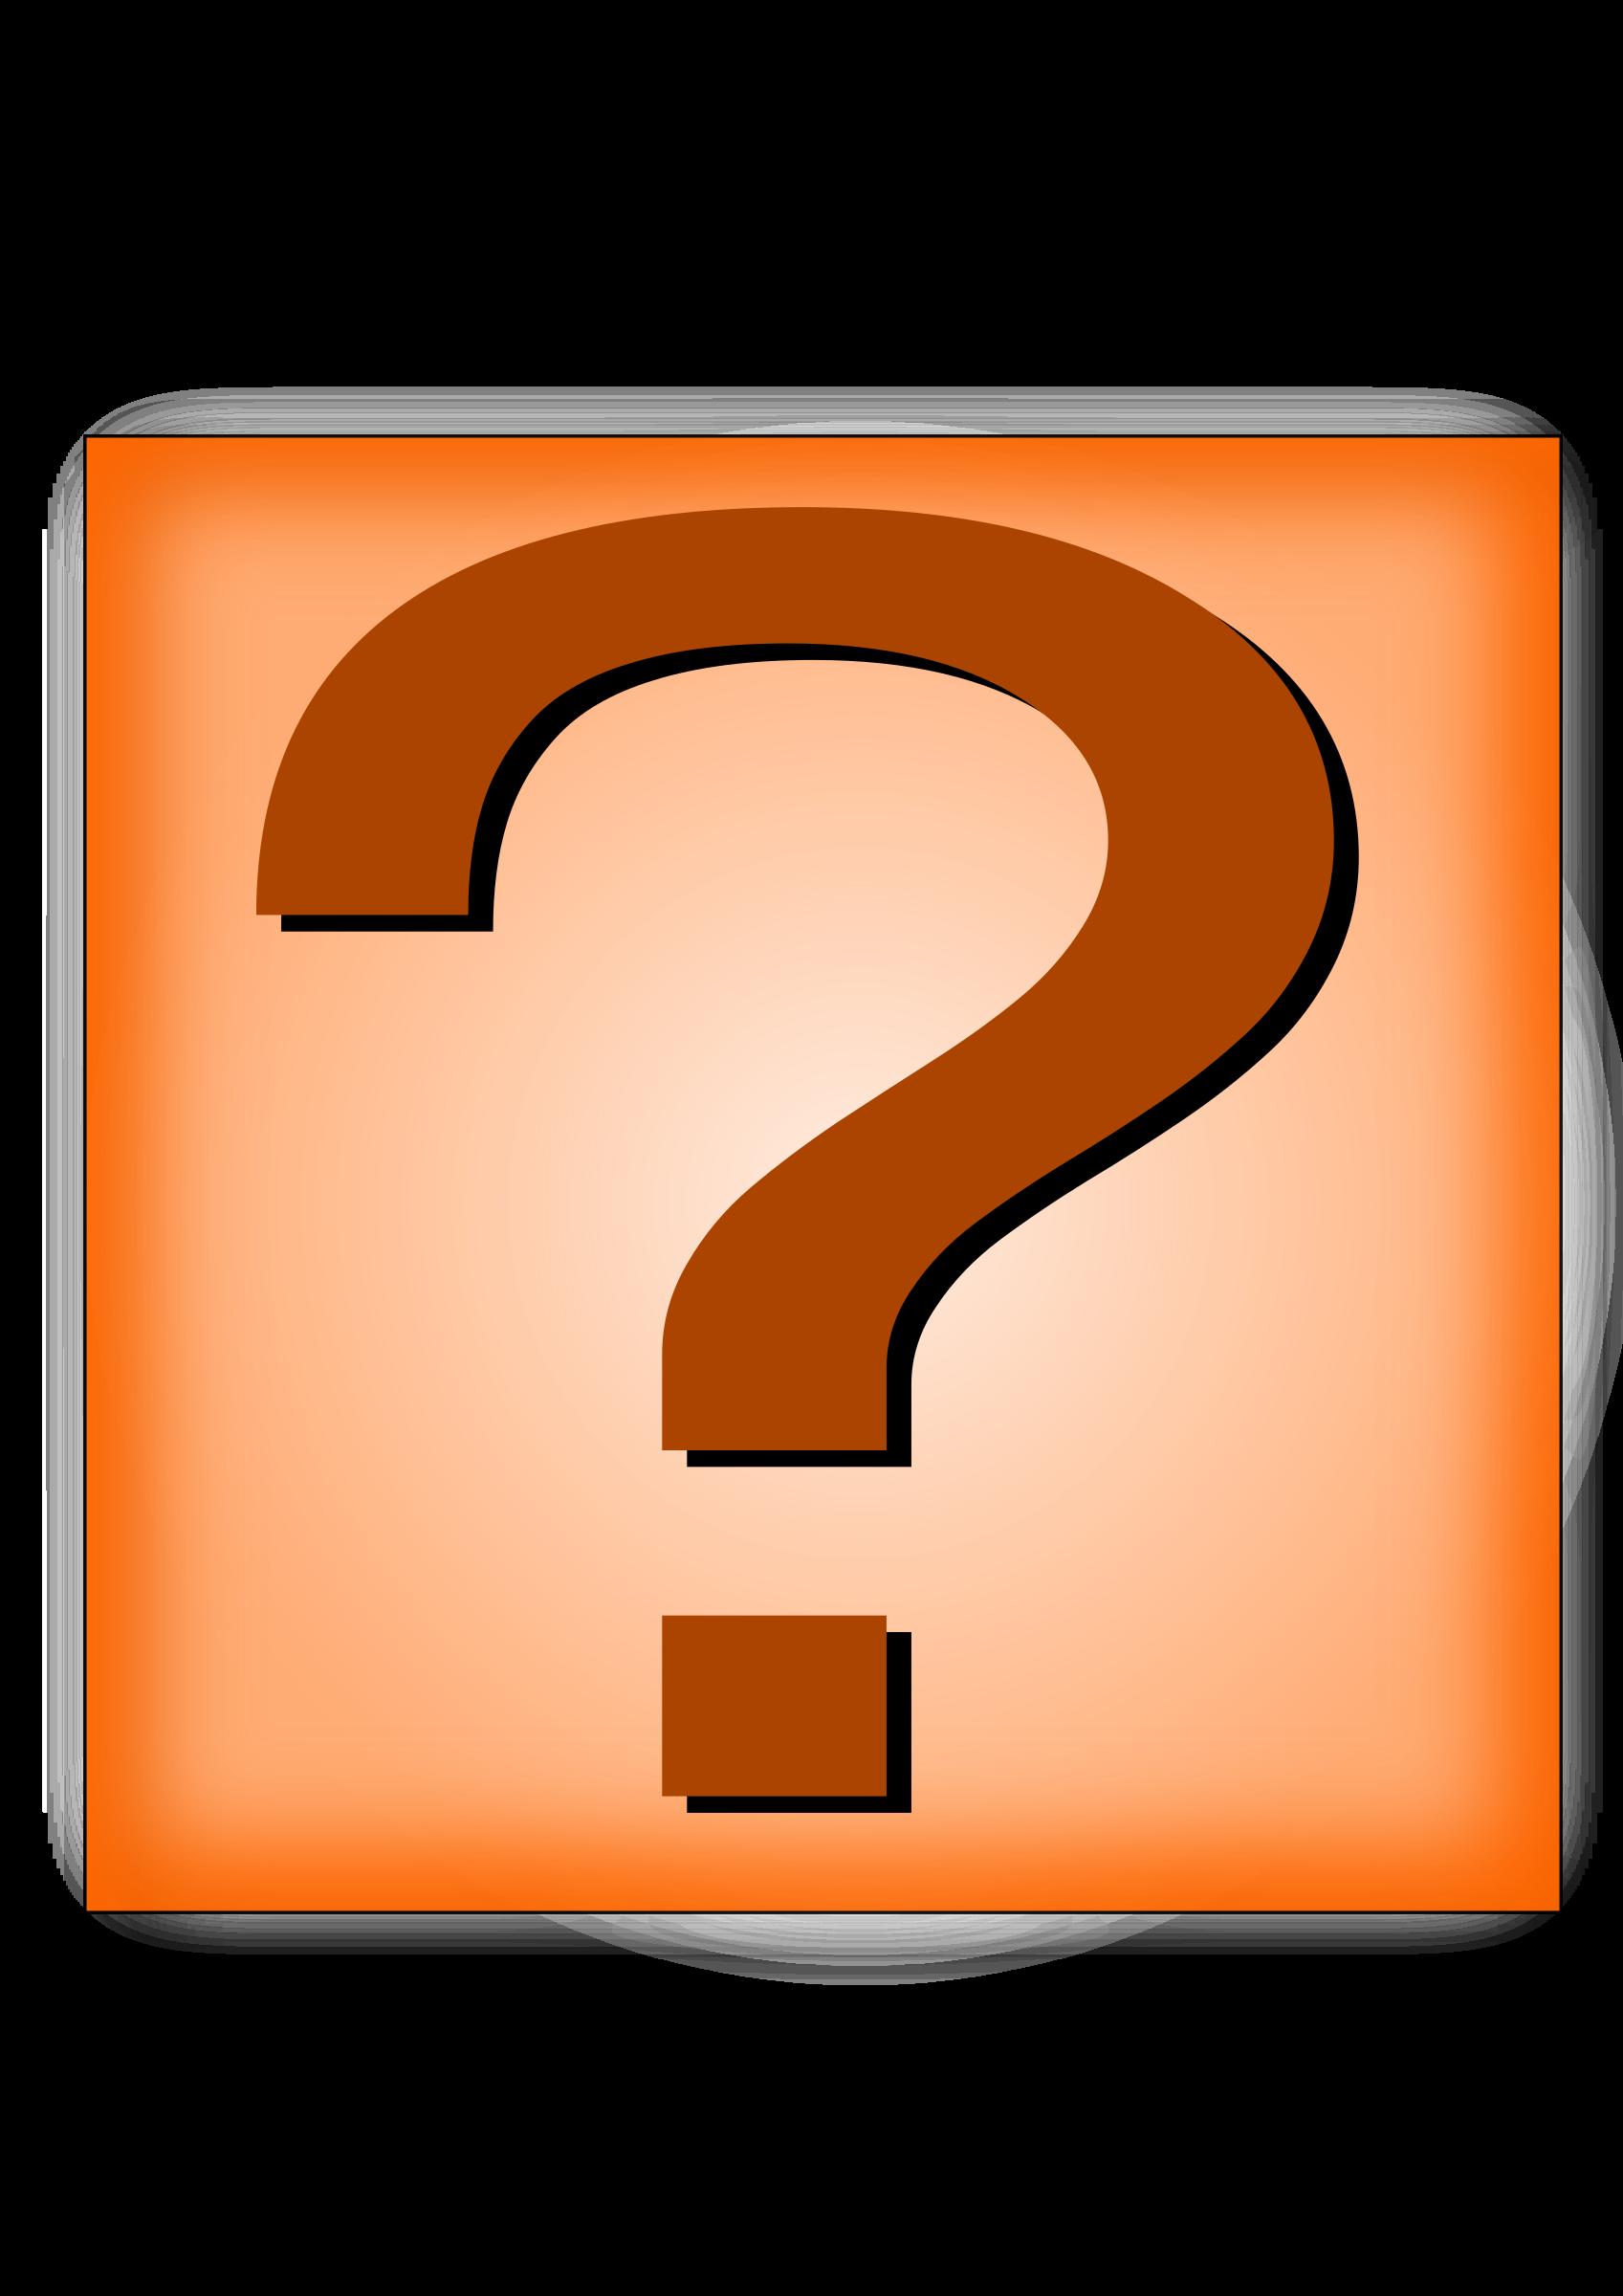 Question mark button big. Number 2 clipart orange